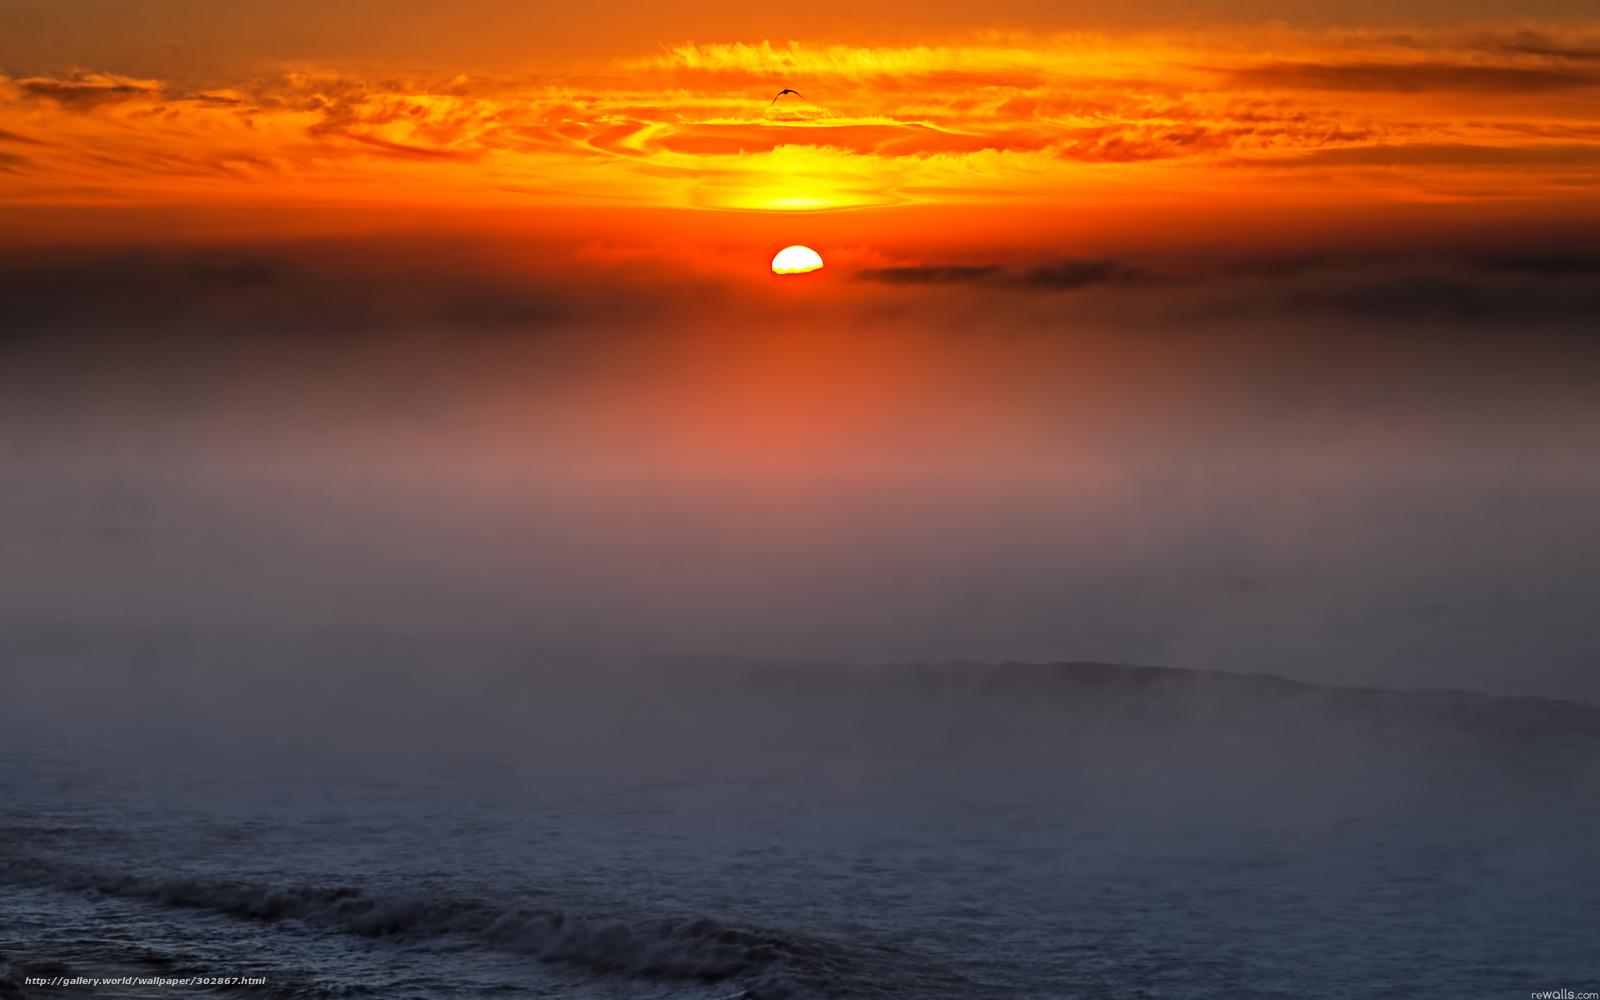 Обои, картинки, скачать, небо, туман, деревья, лес автор: london211 / размер: 4474x2911 / теги: небо, туман, деревья